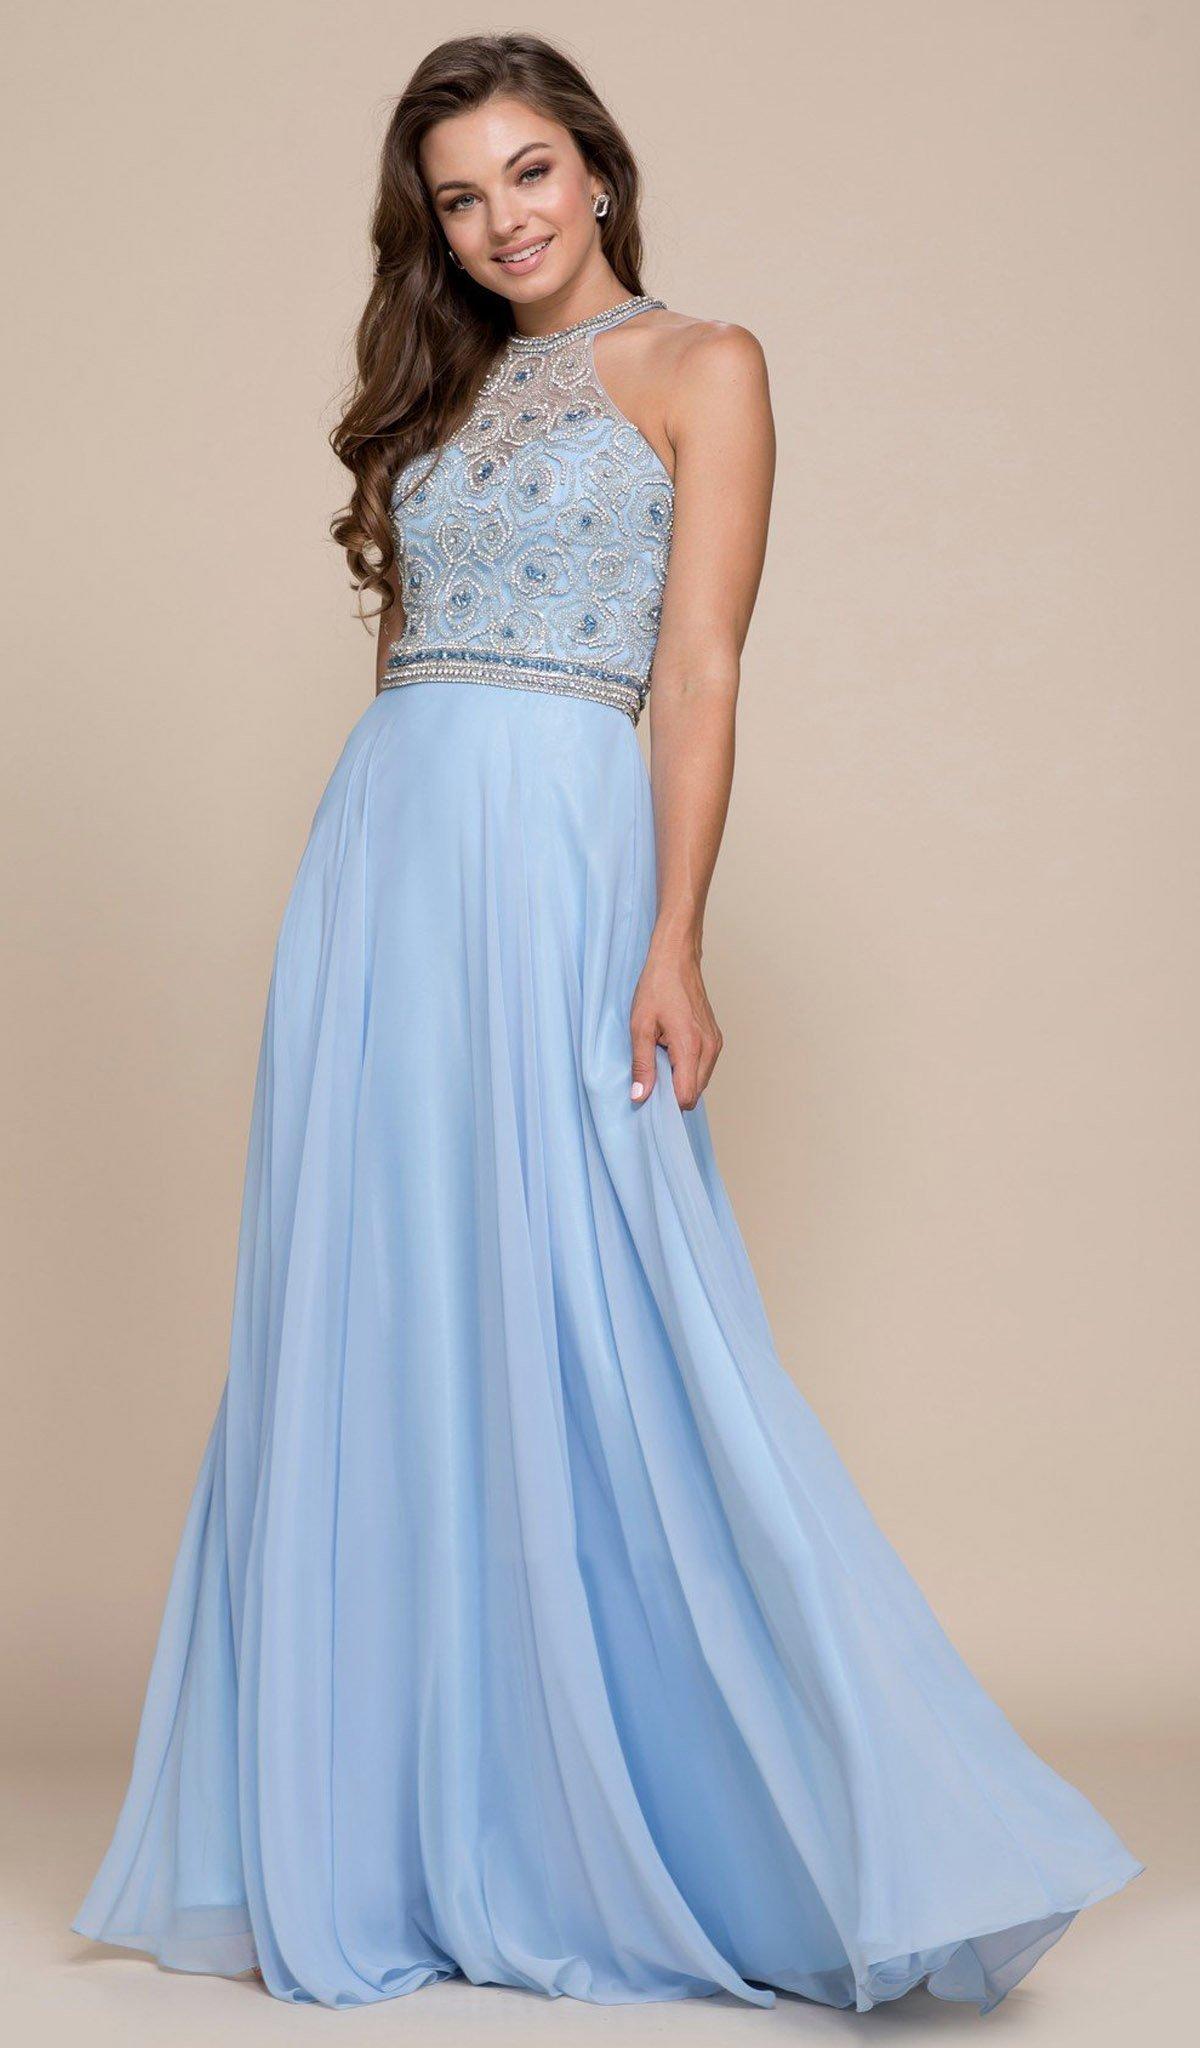 Nox Anabel - 8295 Beaded Illusion Halter A-line Dress